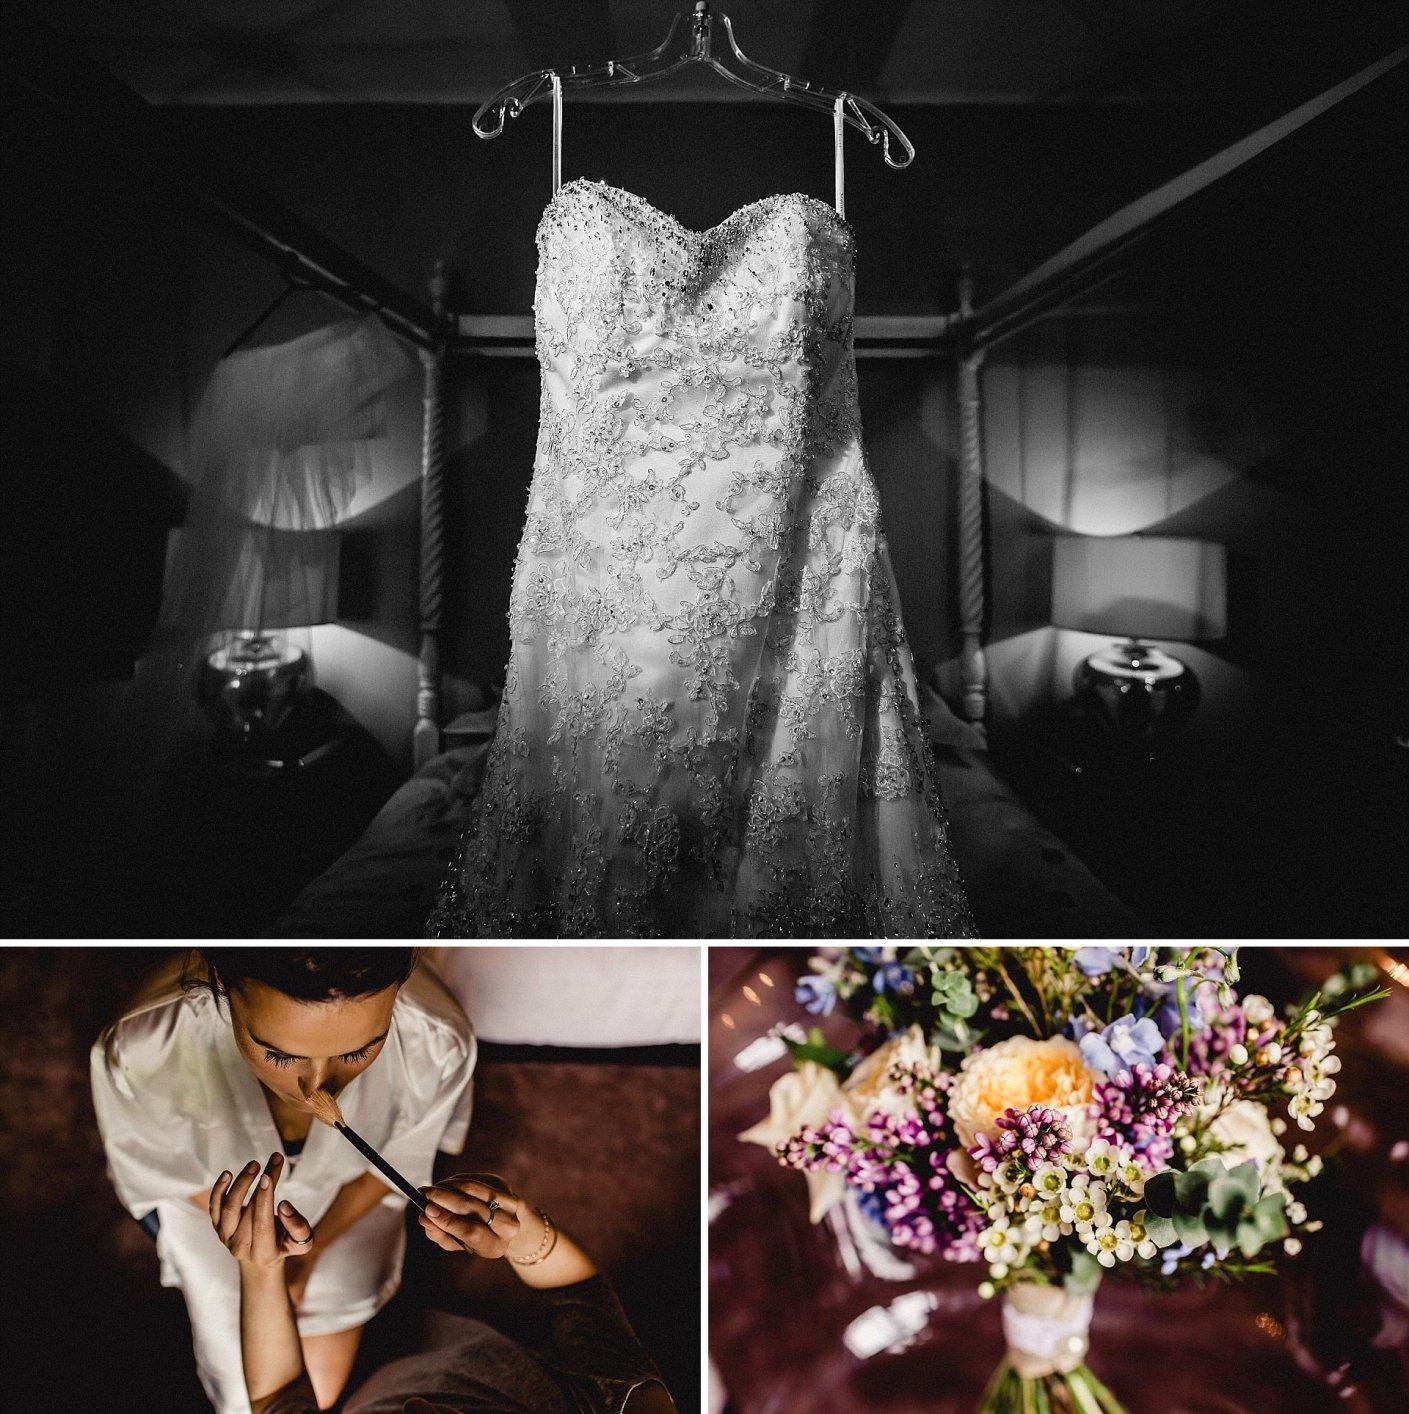 photos, wedding dress, and flowers, boquets